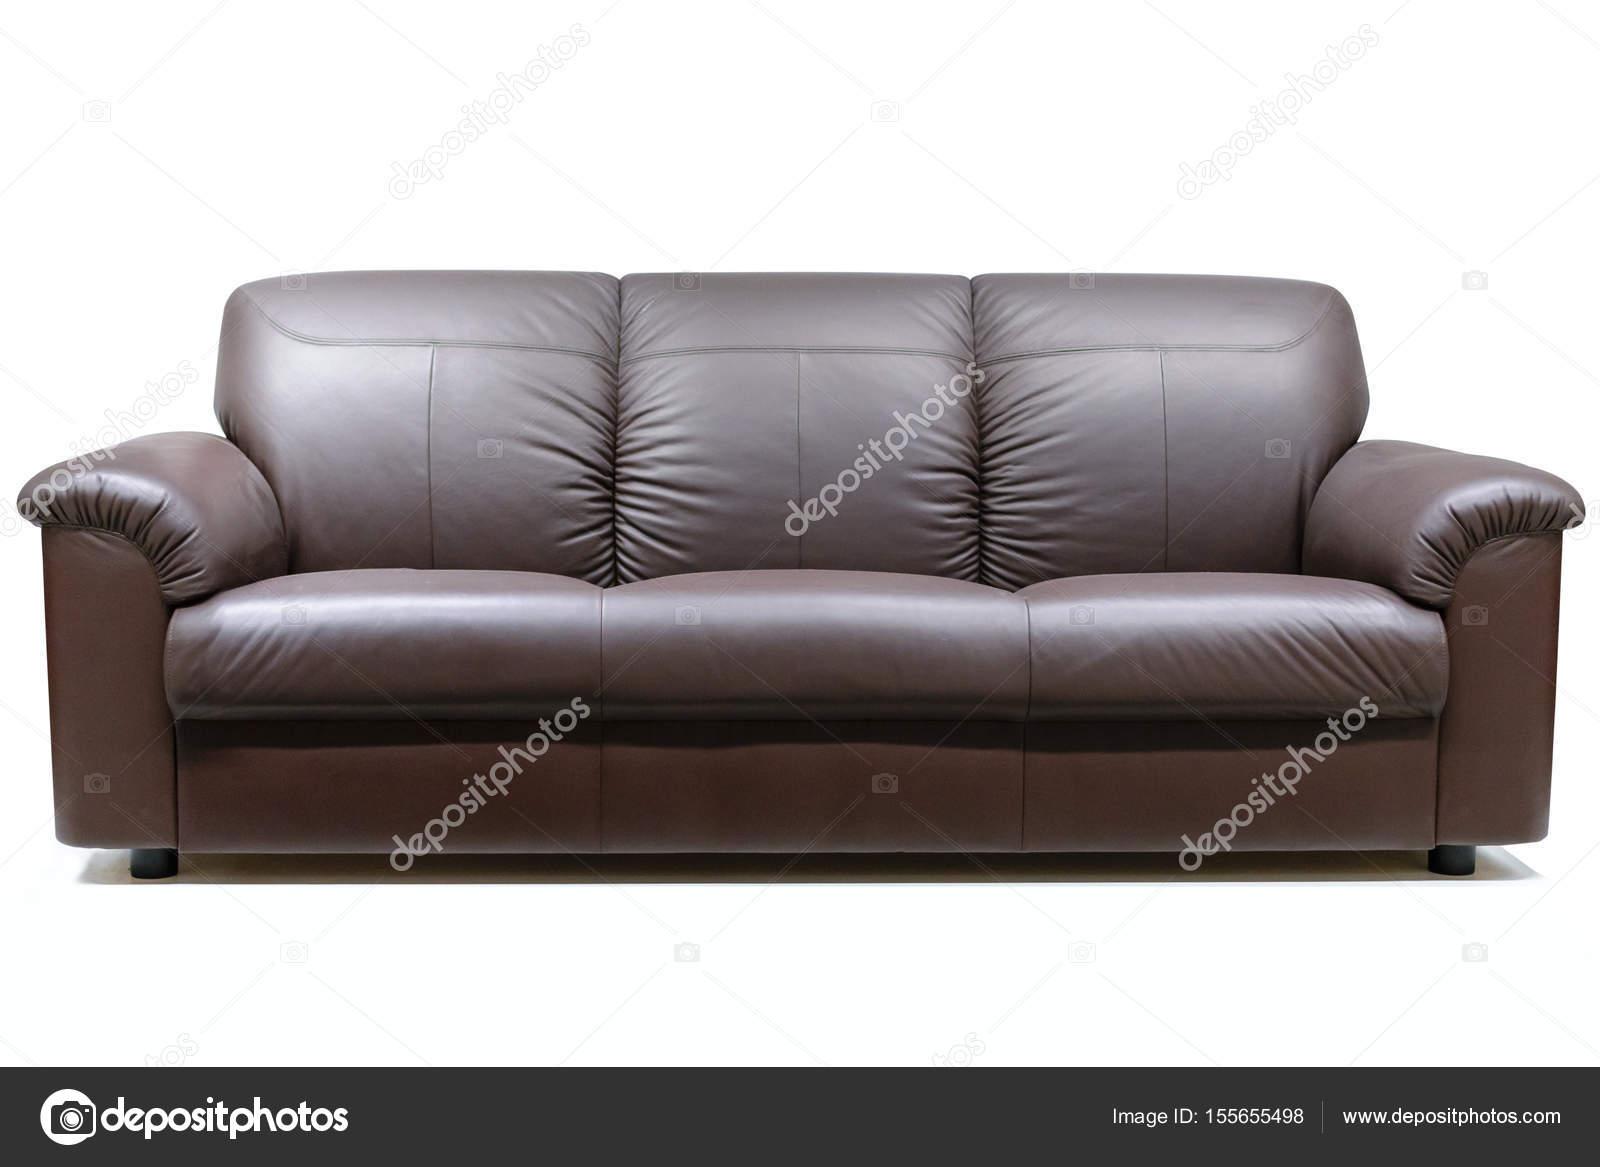 Sofa Moderno E Luxuoso Stock Photo C Wdnet 155655498